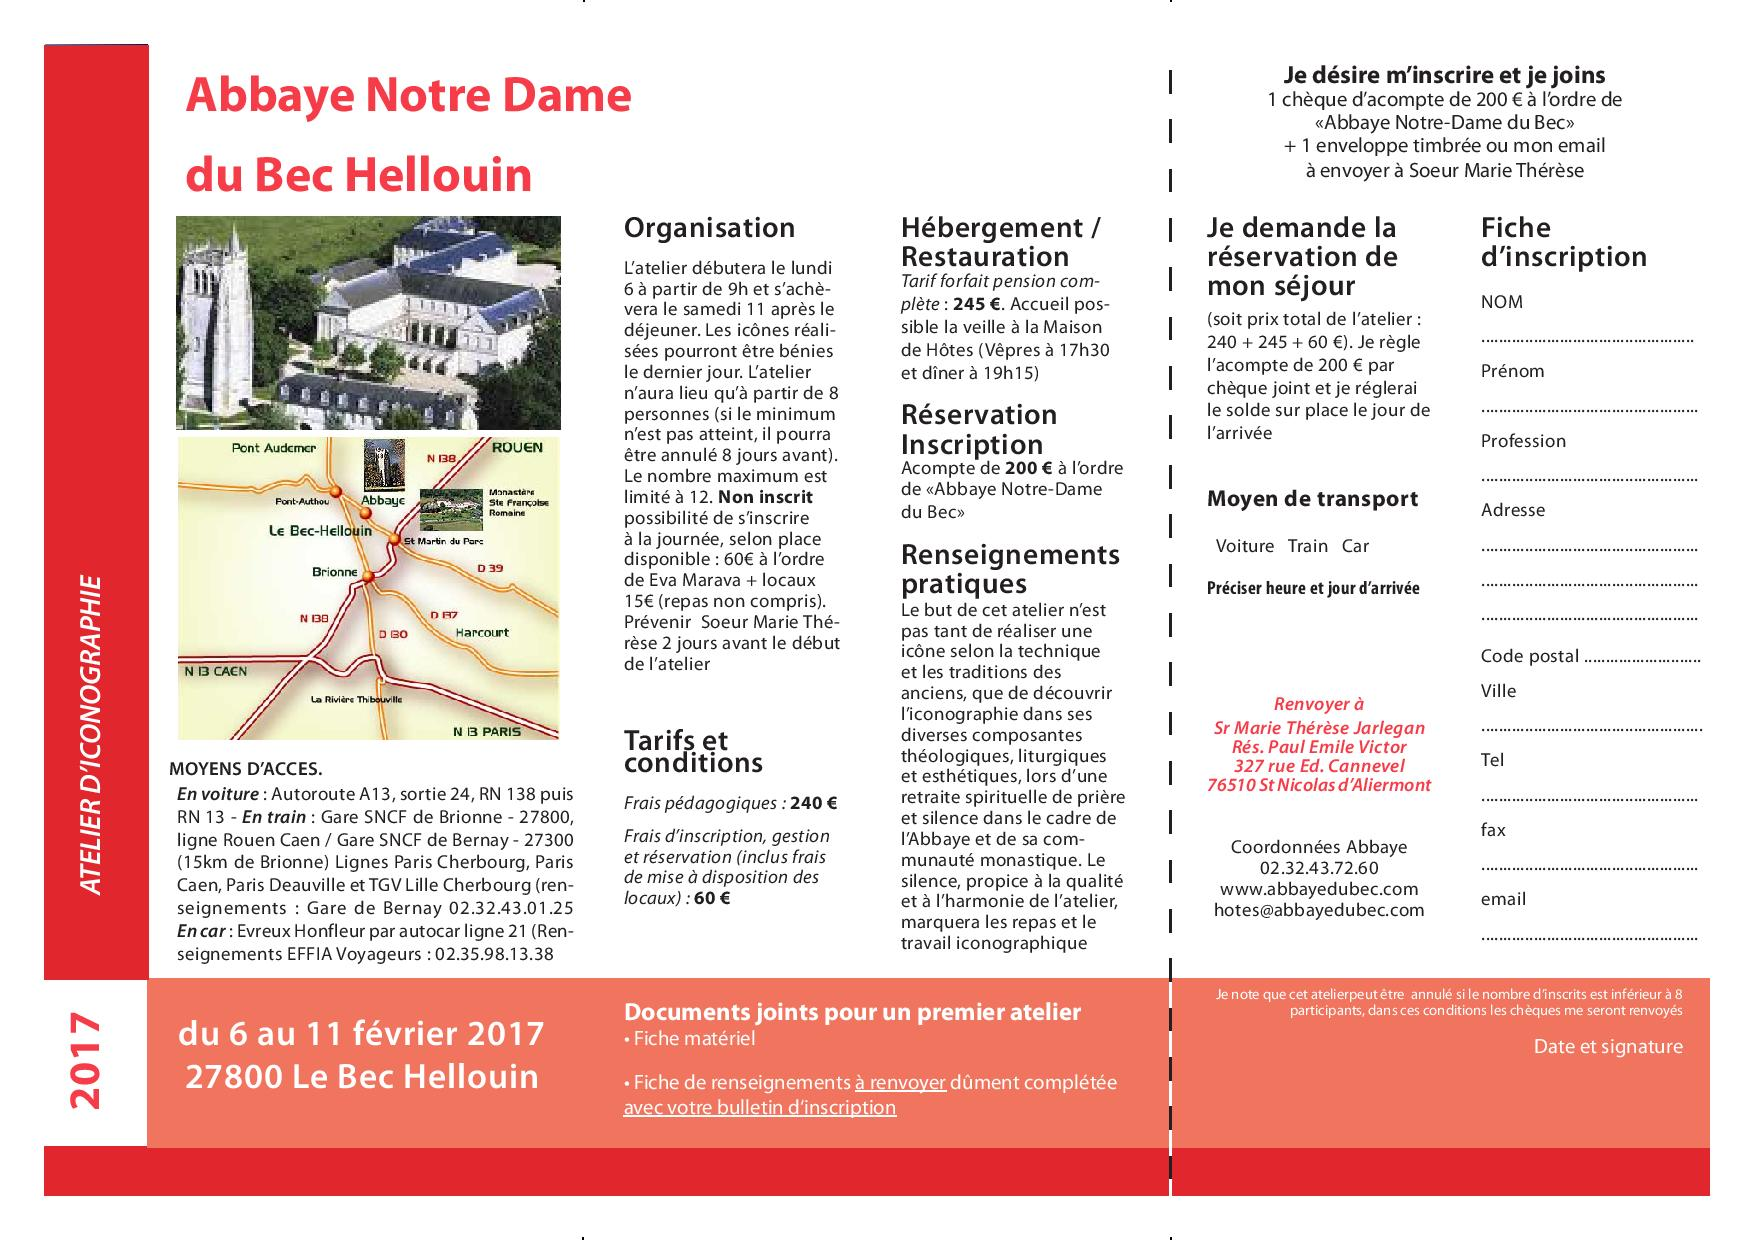 brochure-2017-bec-hellouin-5b310-5d-page-002